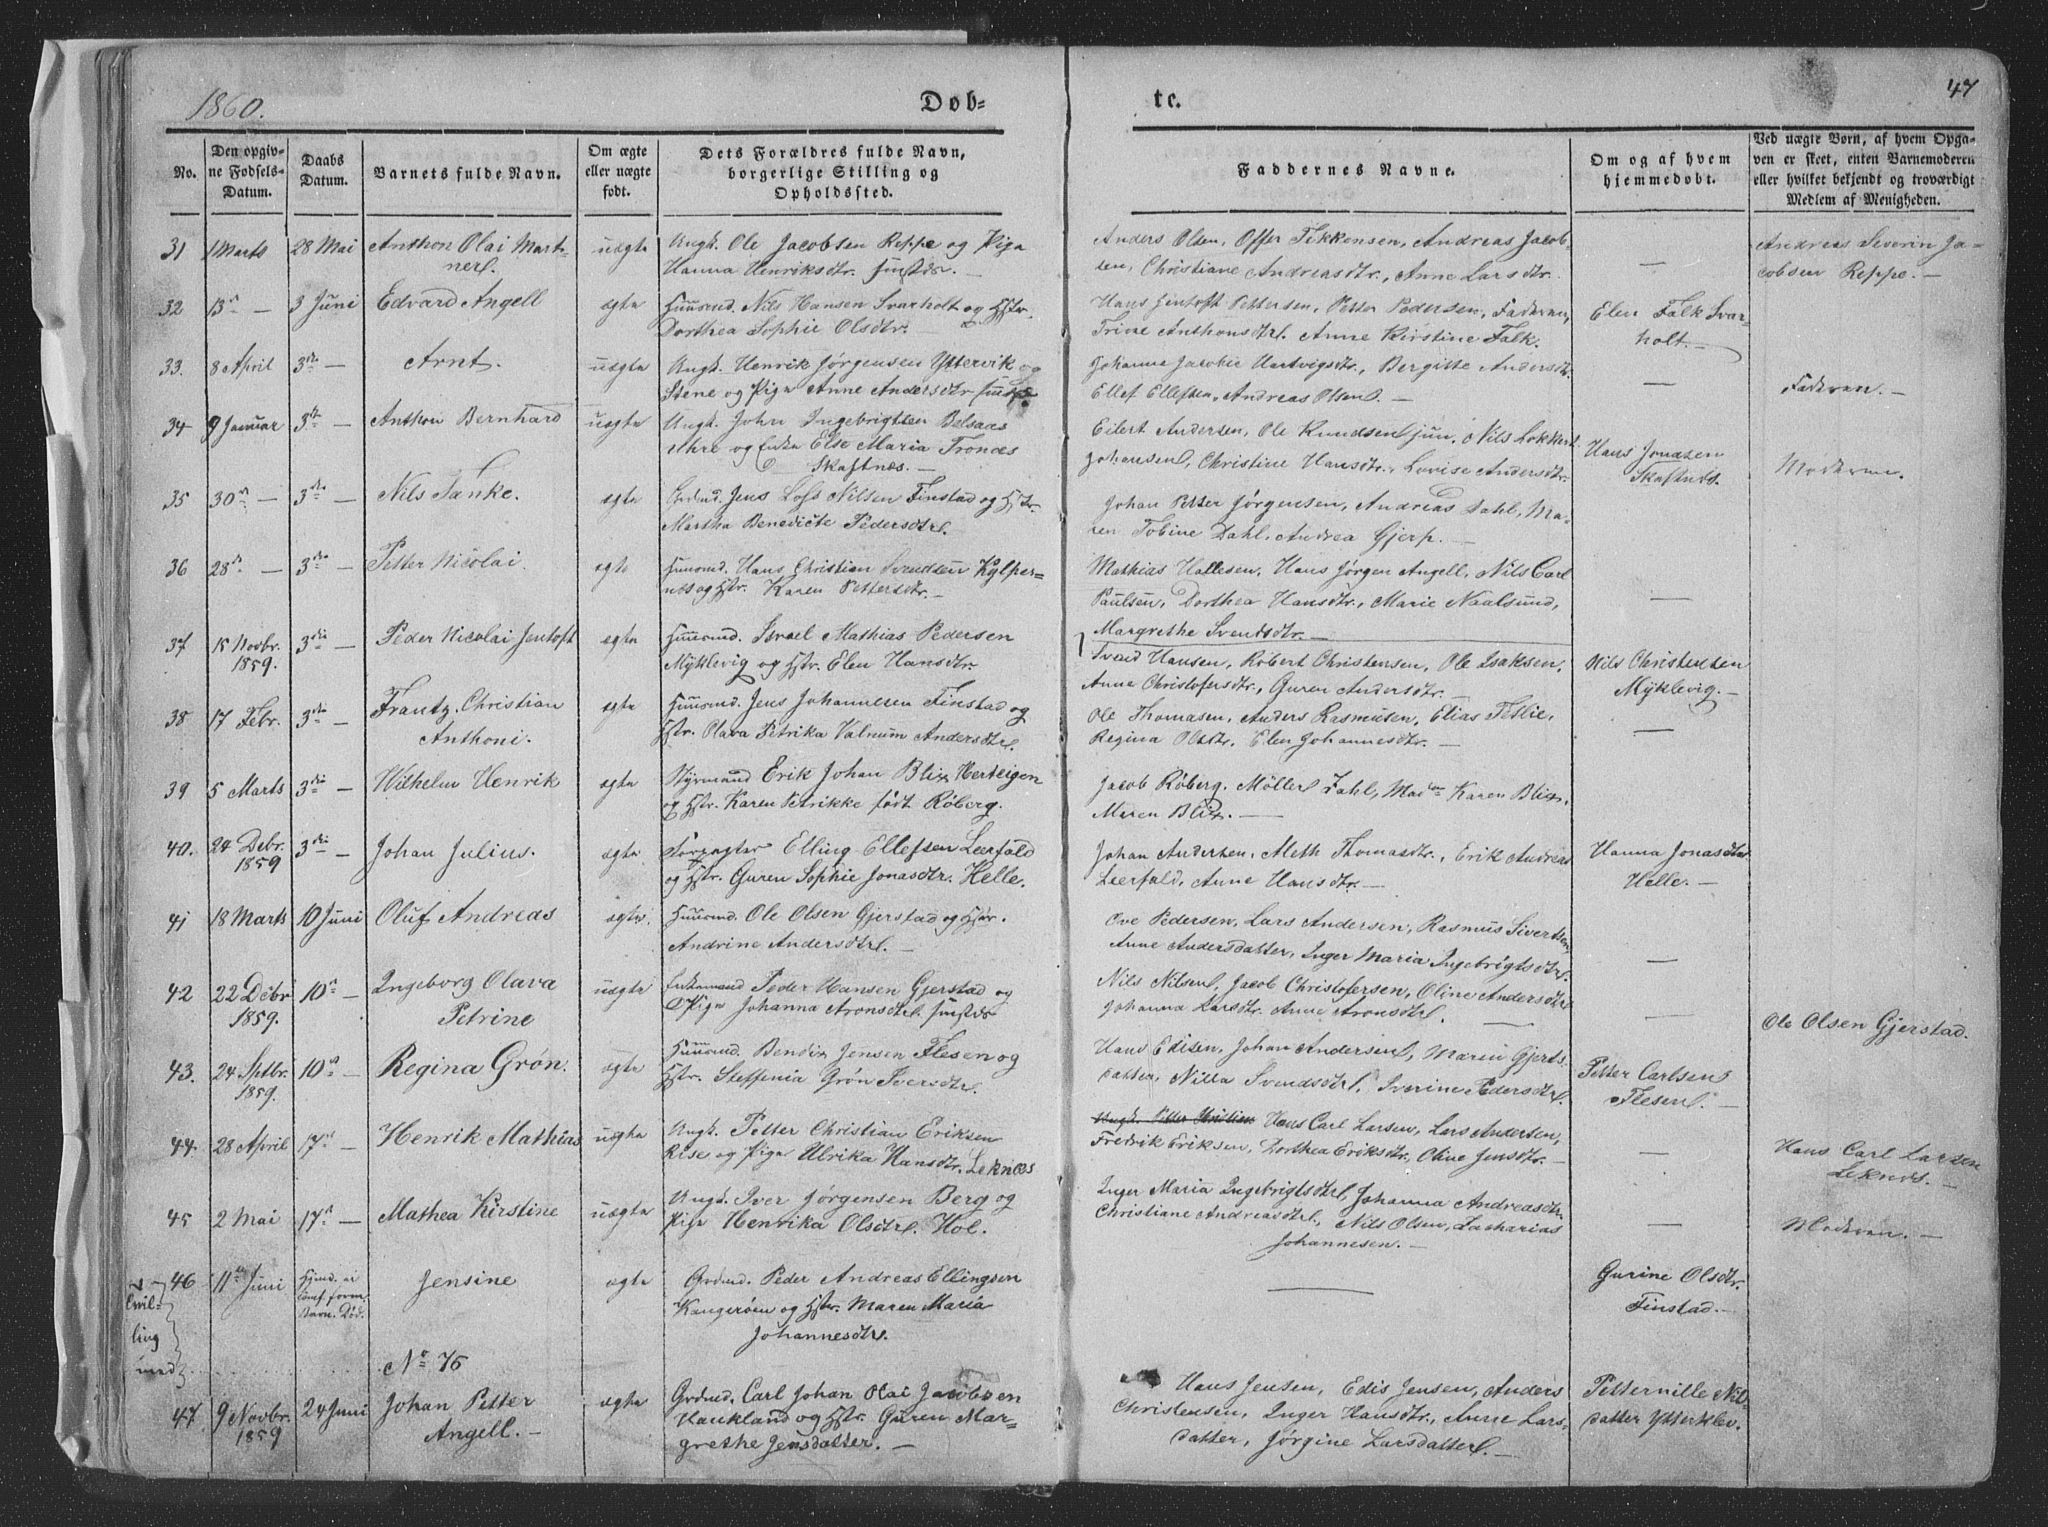 SAT, Ministerialprotokoller, klokkerbøker og fødselsregistre - Nordland, 881/L1165: Klokkerbok nr. 881C02, 1854-1876, s. 47